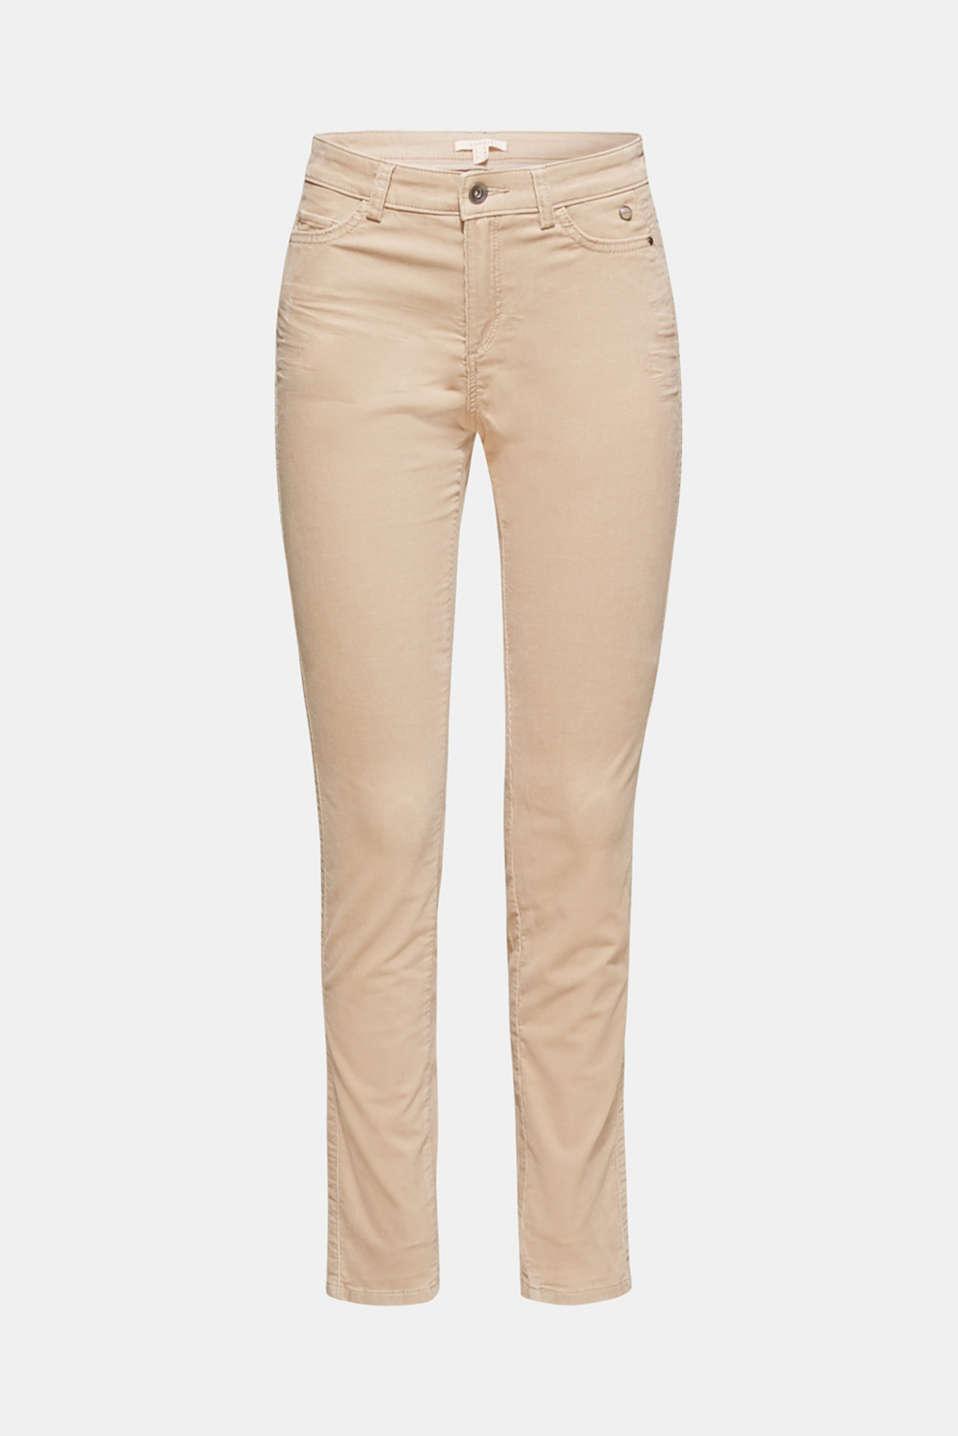 Pants woven, LIGHT BEIGE, detail image number 6